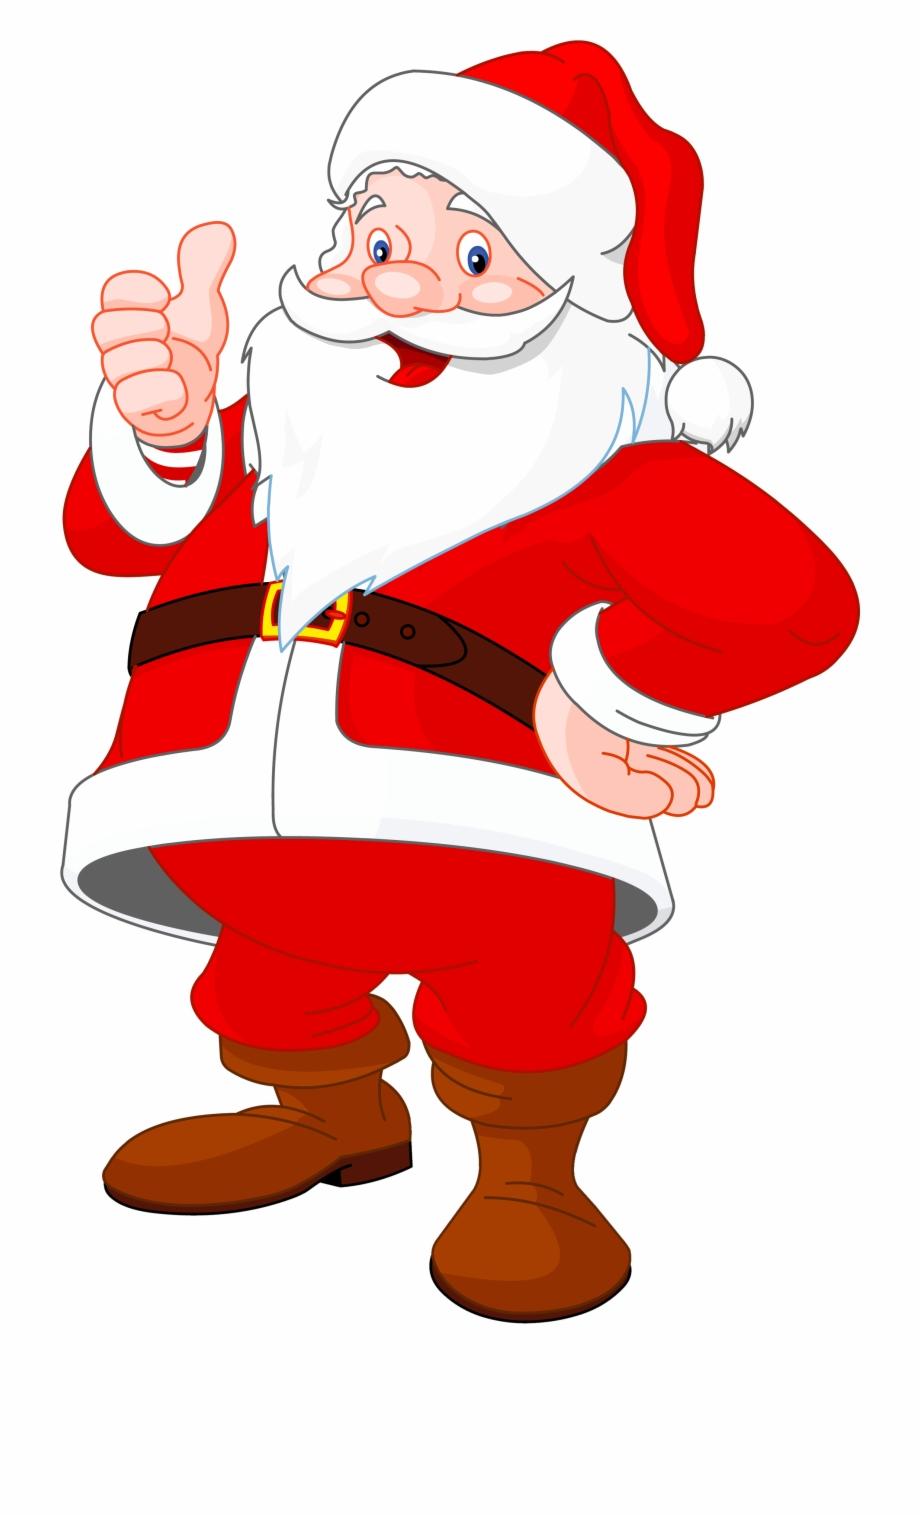 Christmas Hat Cartoon Transparent.Santa Claus Clipart Png Free Download Santa Claus